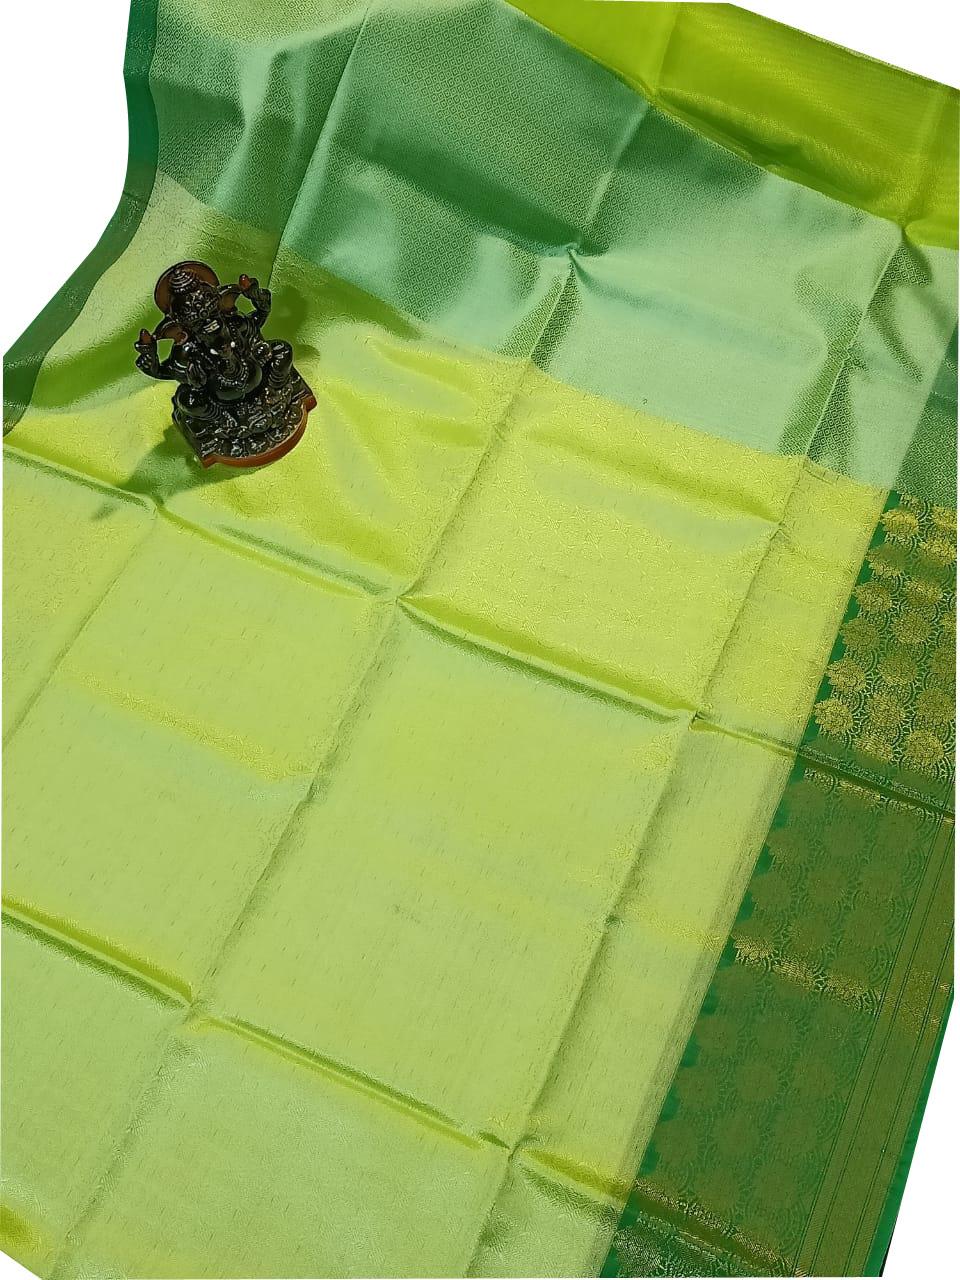 Lime green and Deep green kora silk saree with kuppatam border